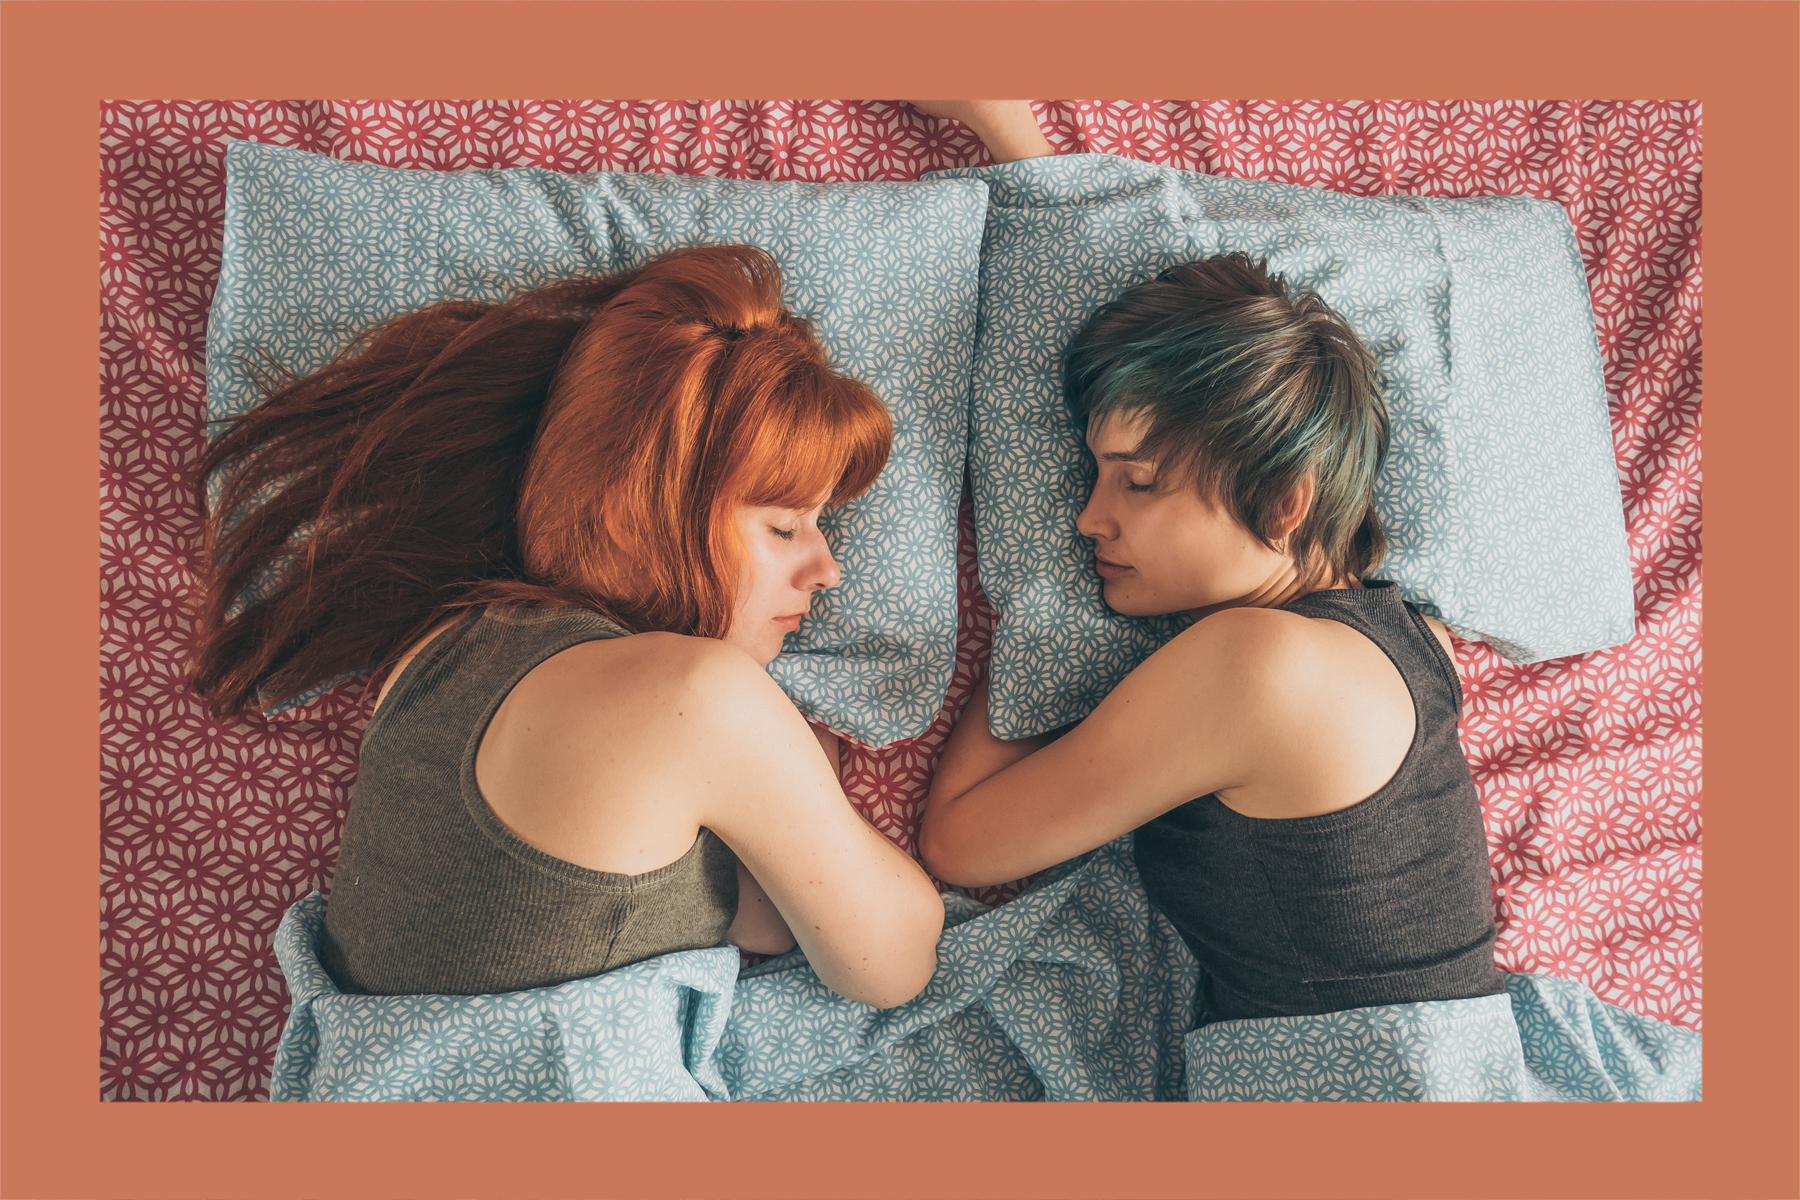 relationship dreams